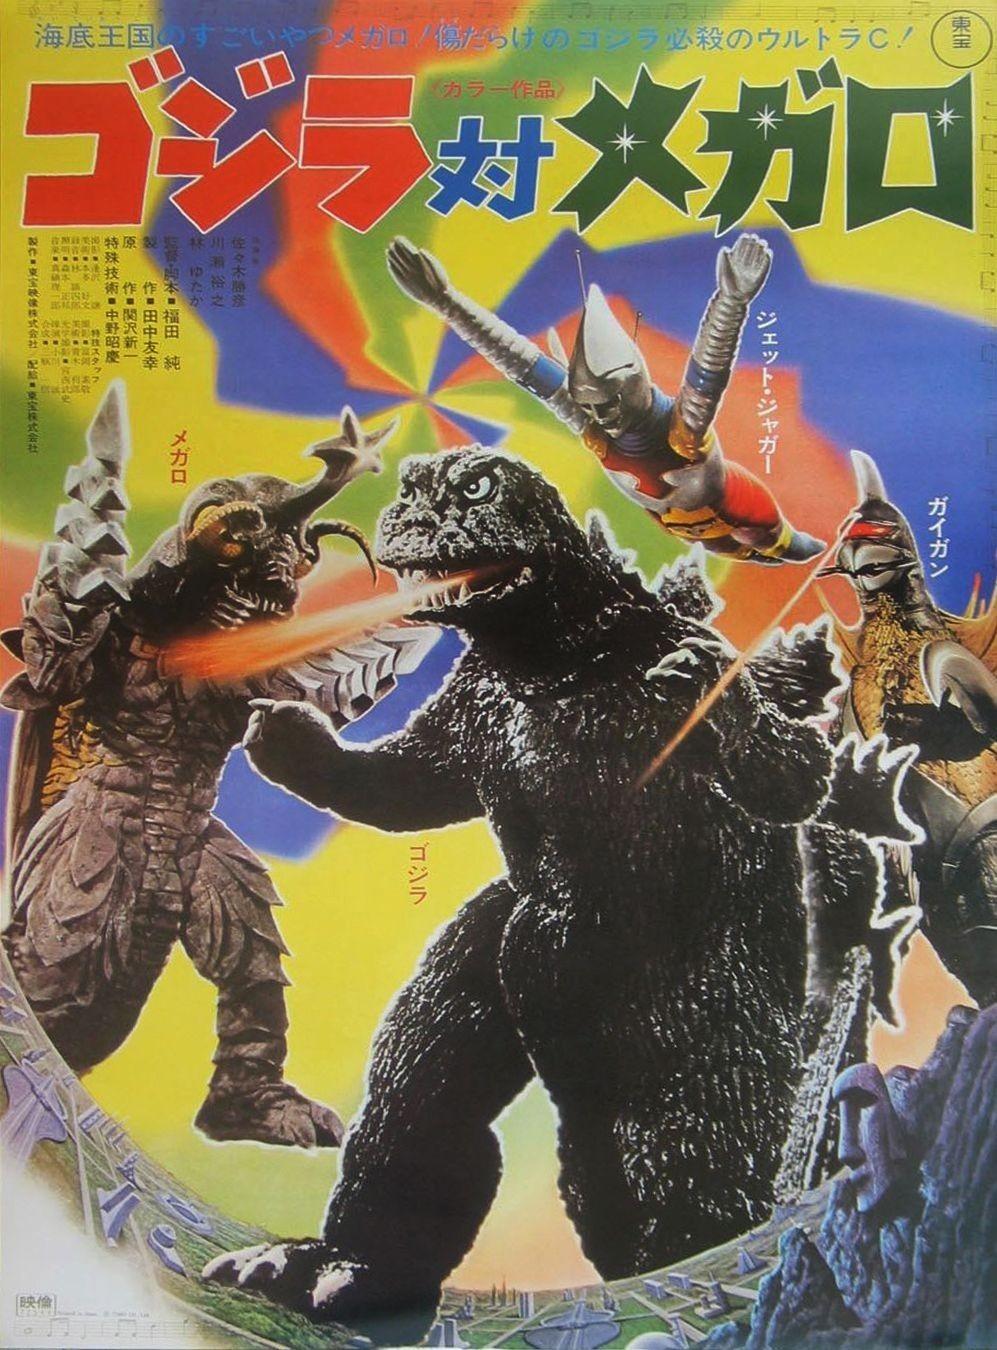 Godzilla vs. Megalon poster